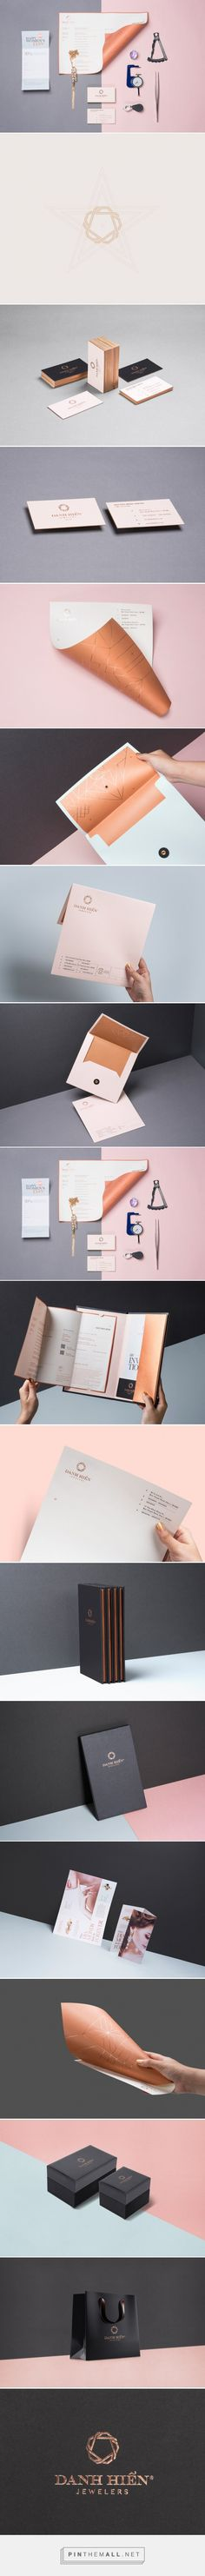 Elegant Branding Design for Danh Hien Jewelers - created via https://pinthemall.net